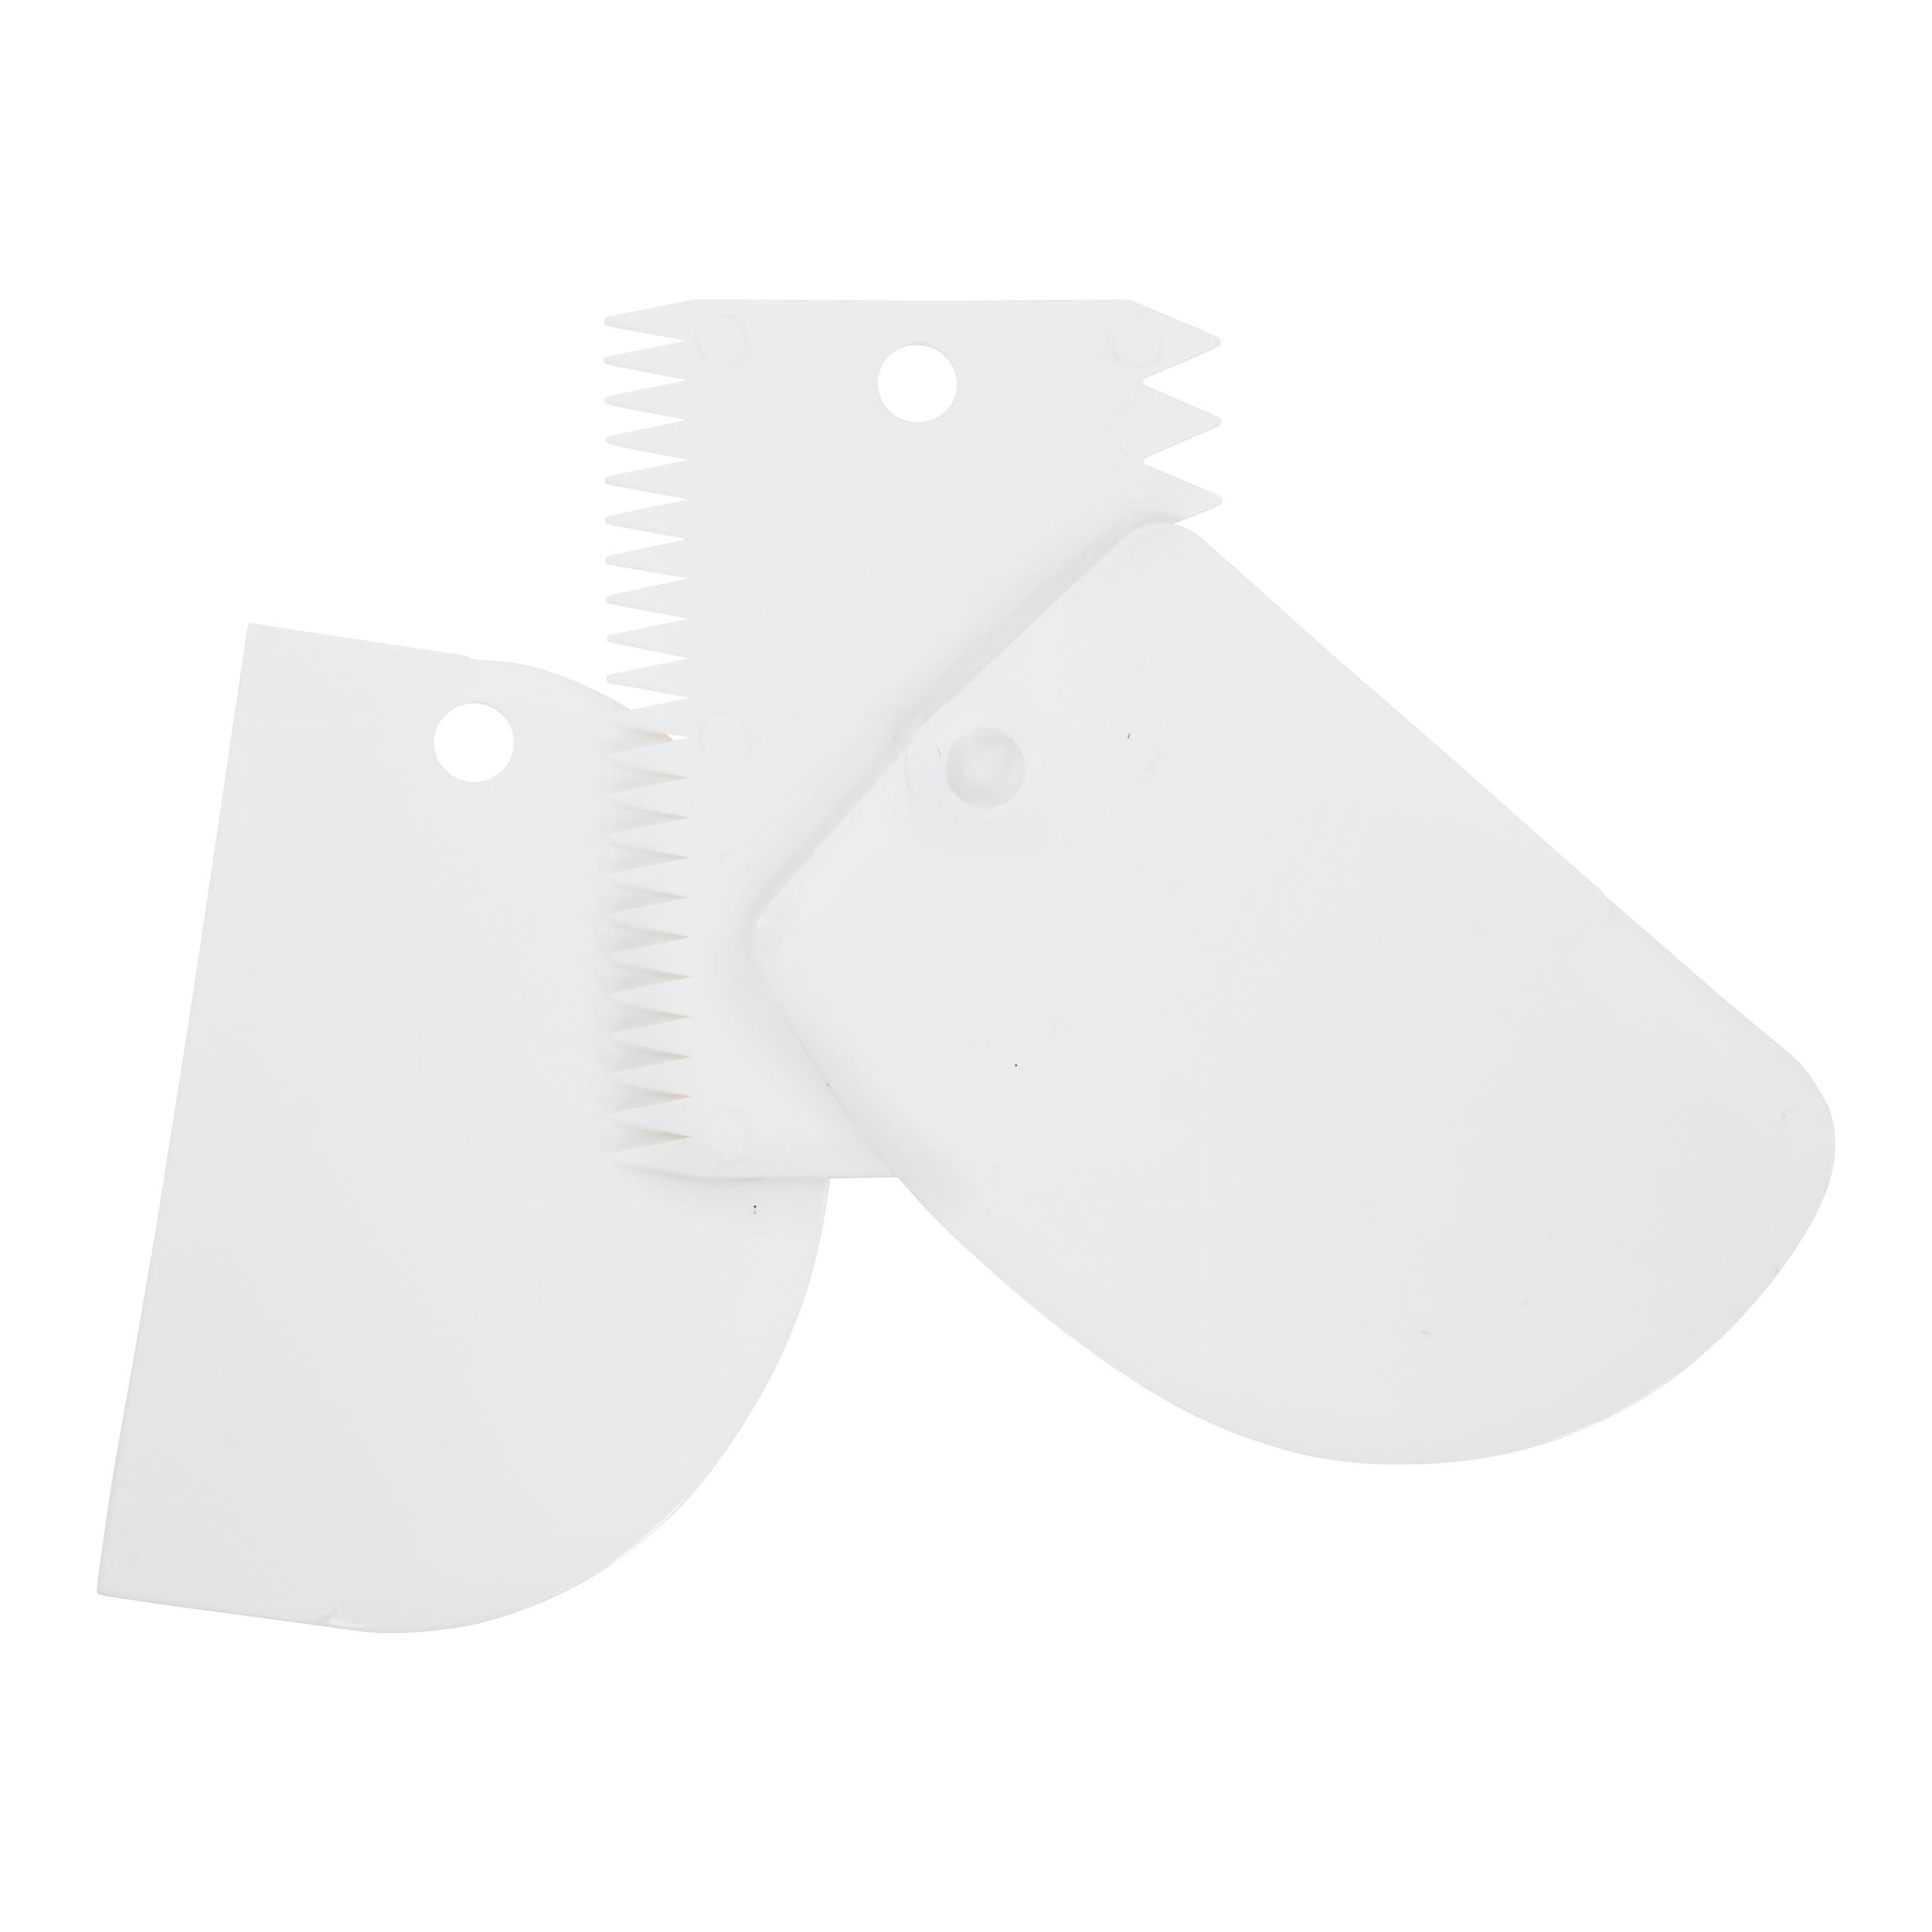 DEIGSKRAPE 3PK PLAST-BAK1018